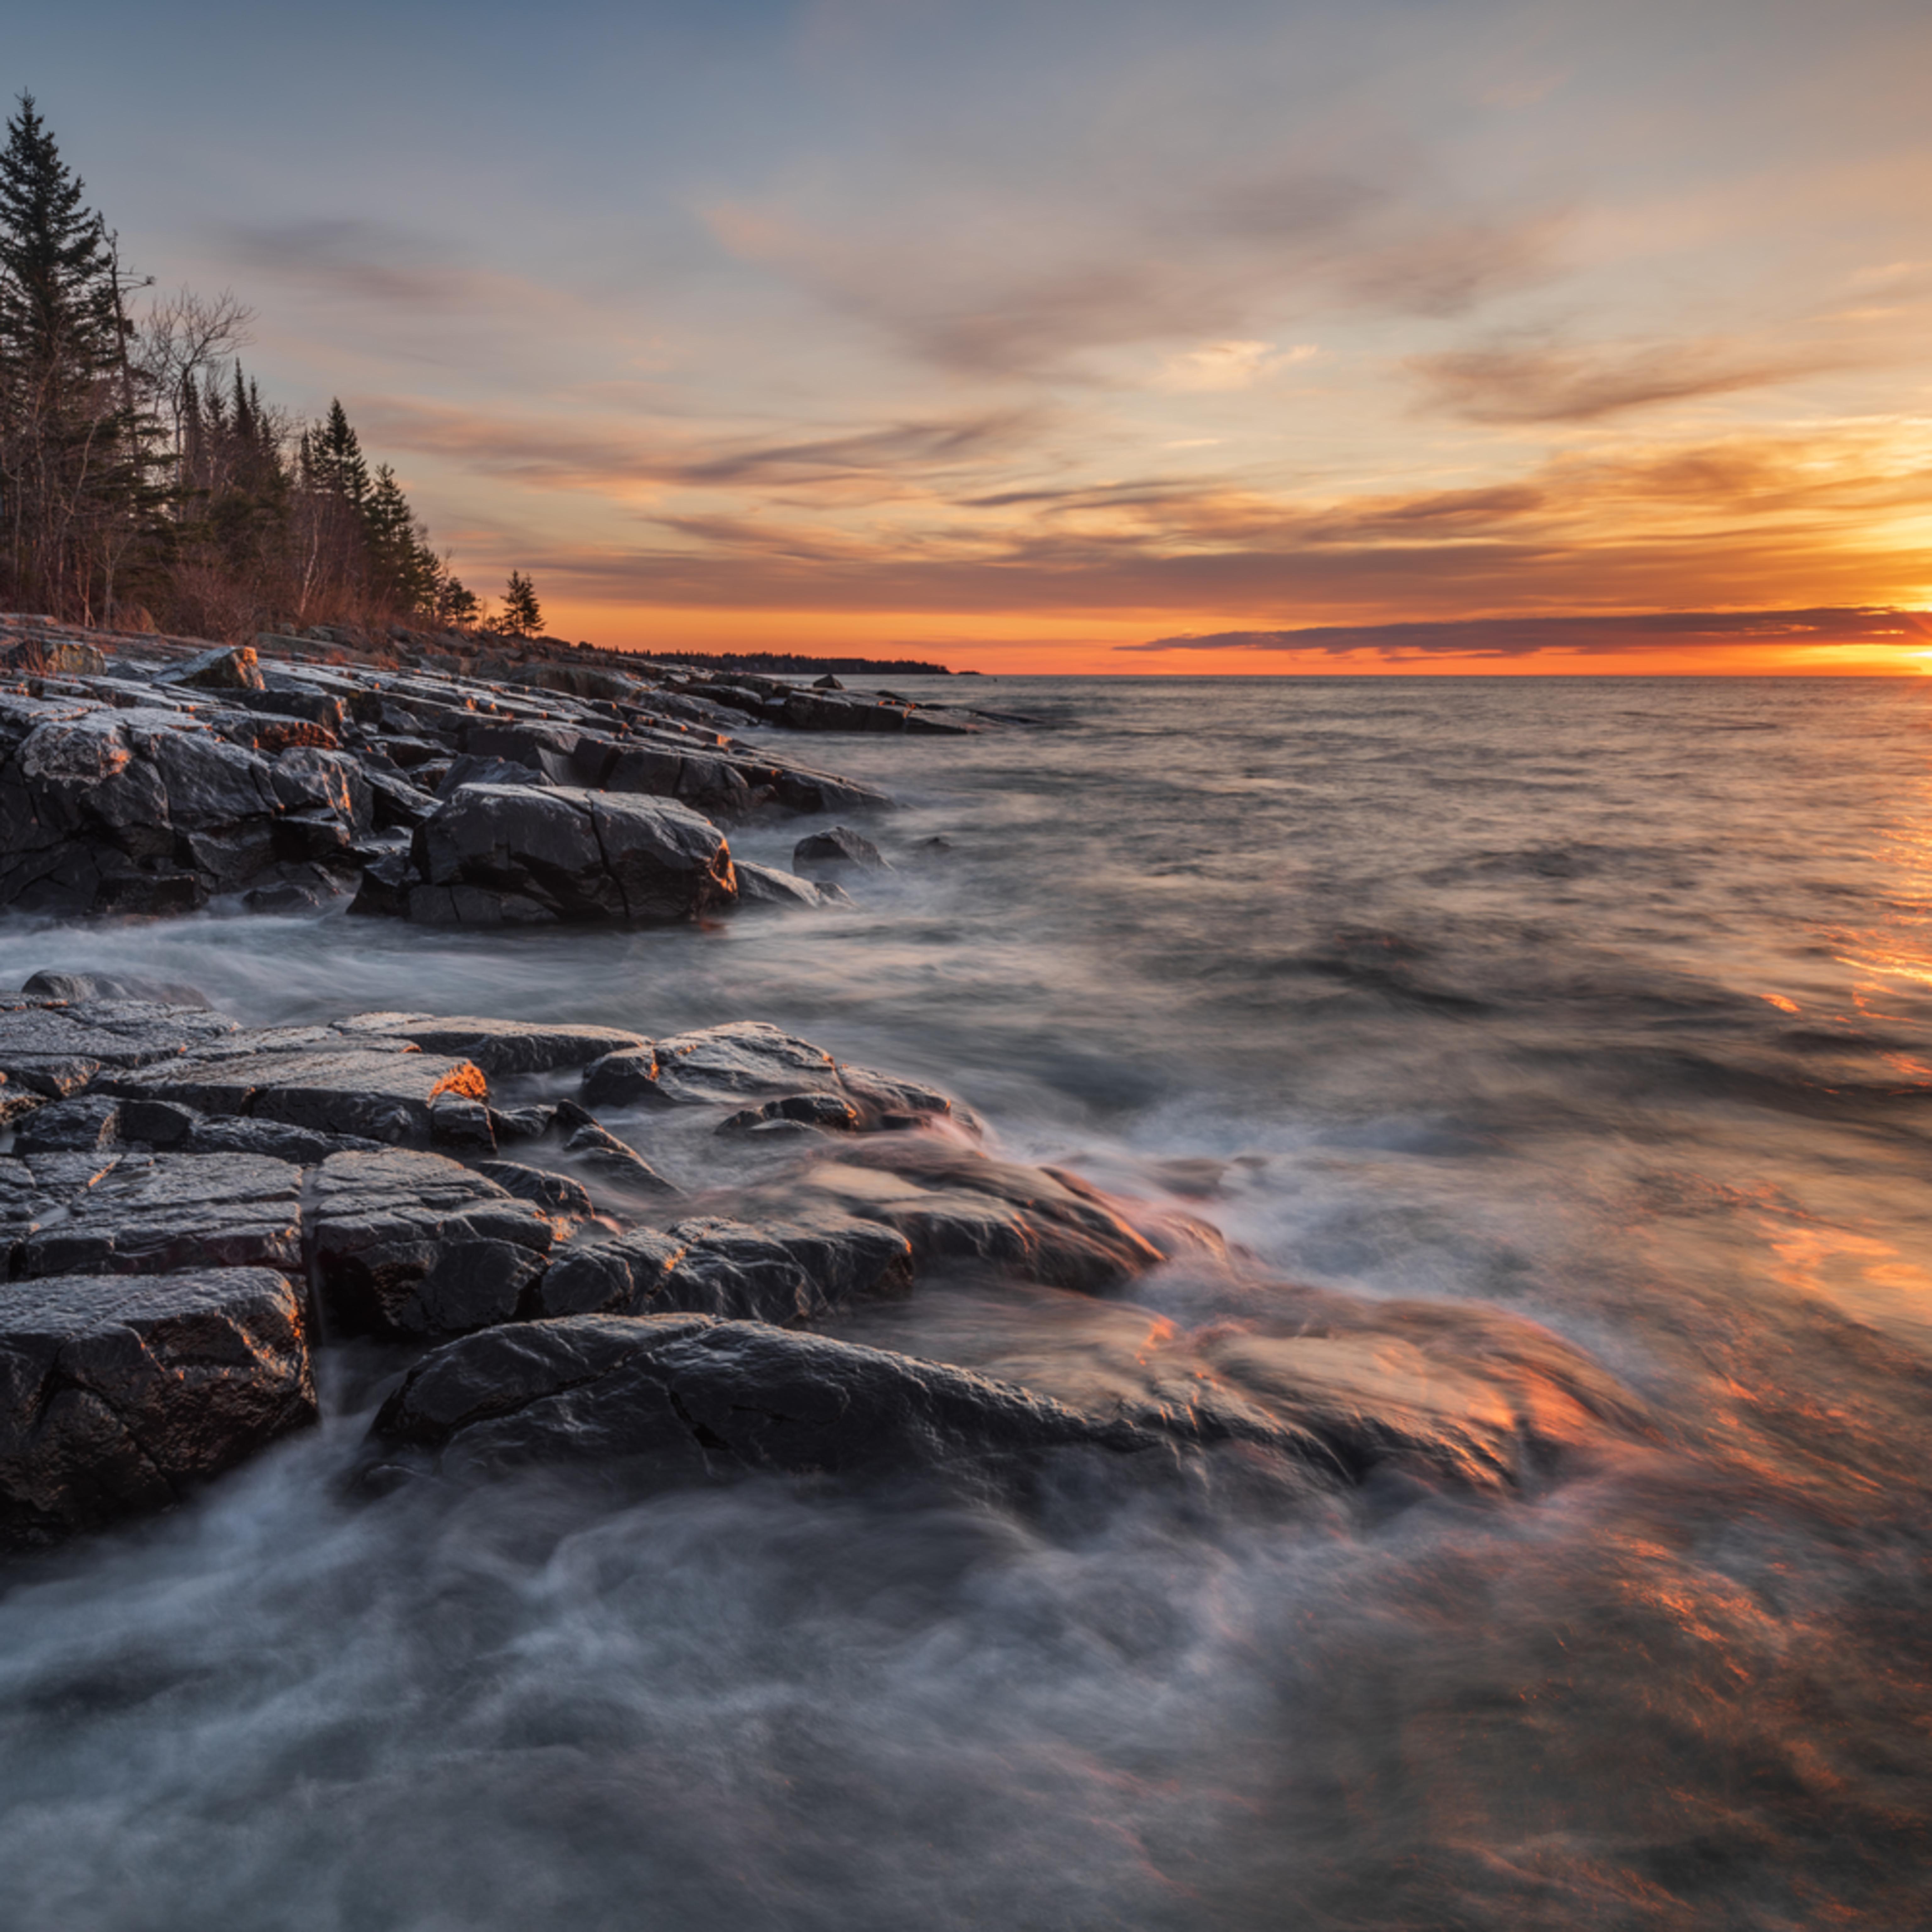 Stoney point sunrise ipv5jt